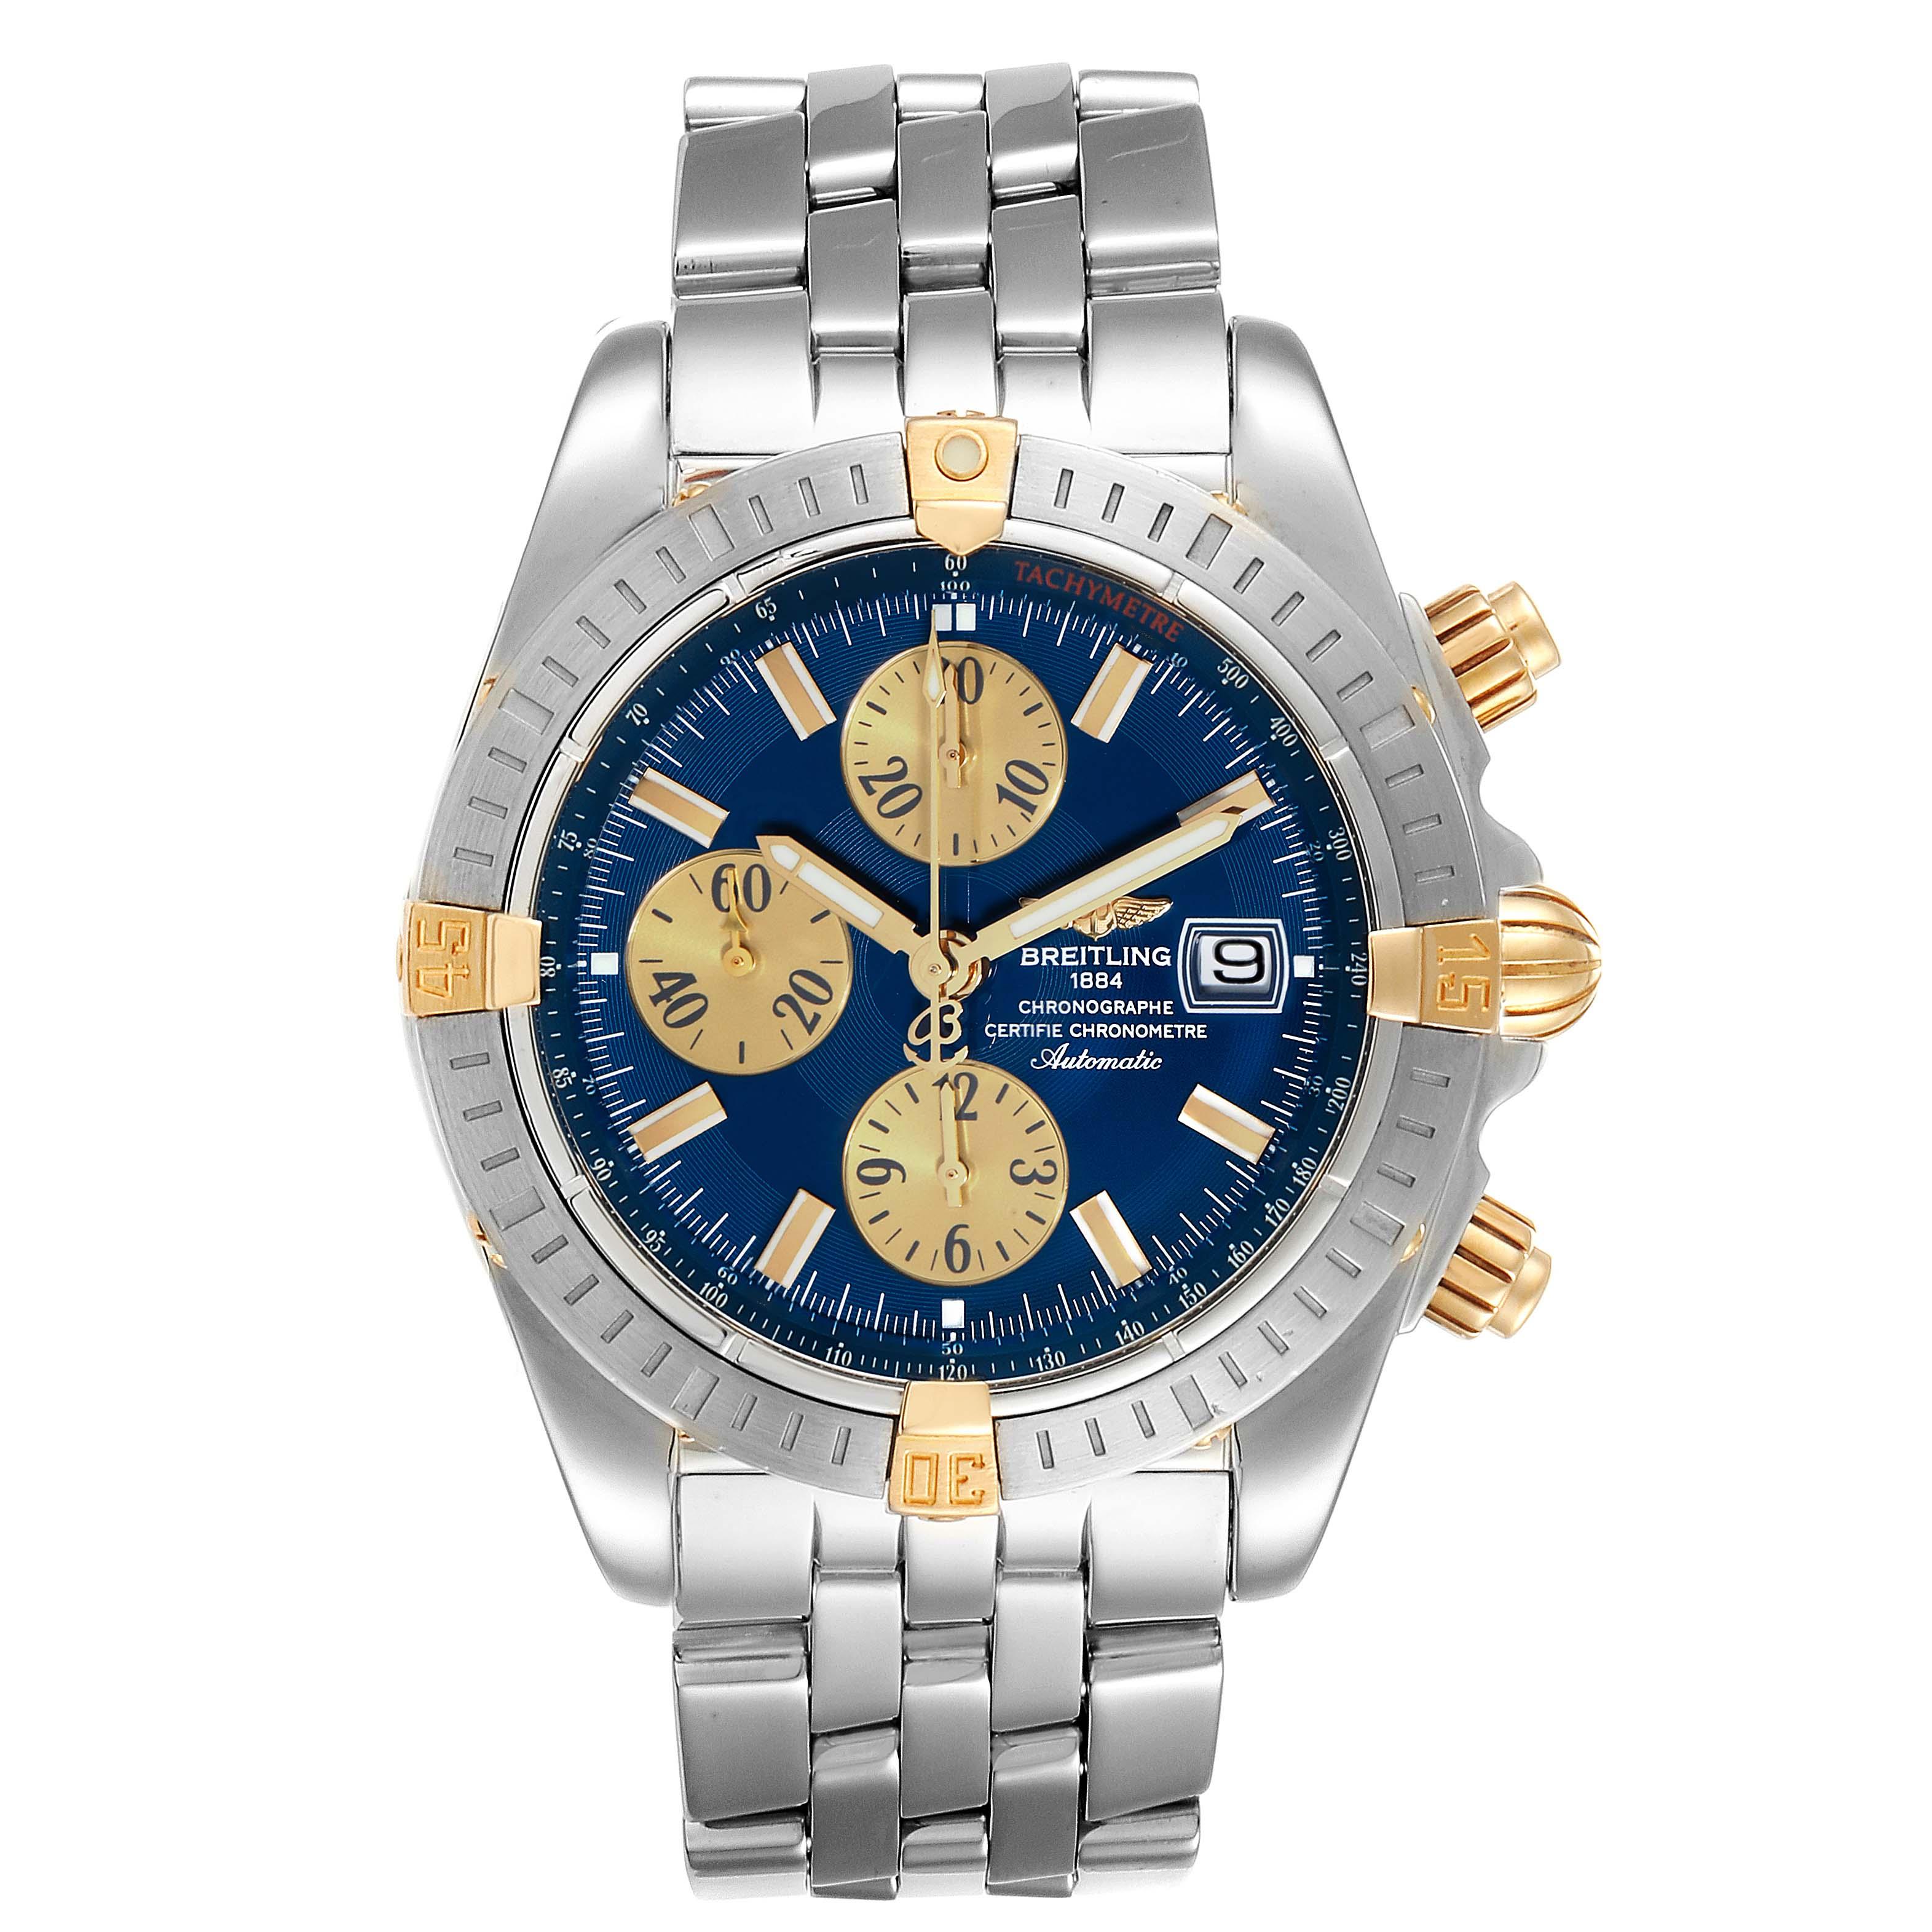 Breitling Chronomat Steel 18K Yellow Gold Blue Dial Mens Watch B13356 SwissWatchExpo